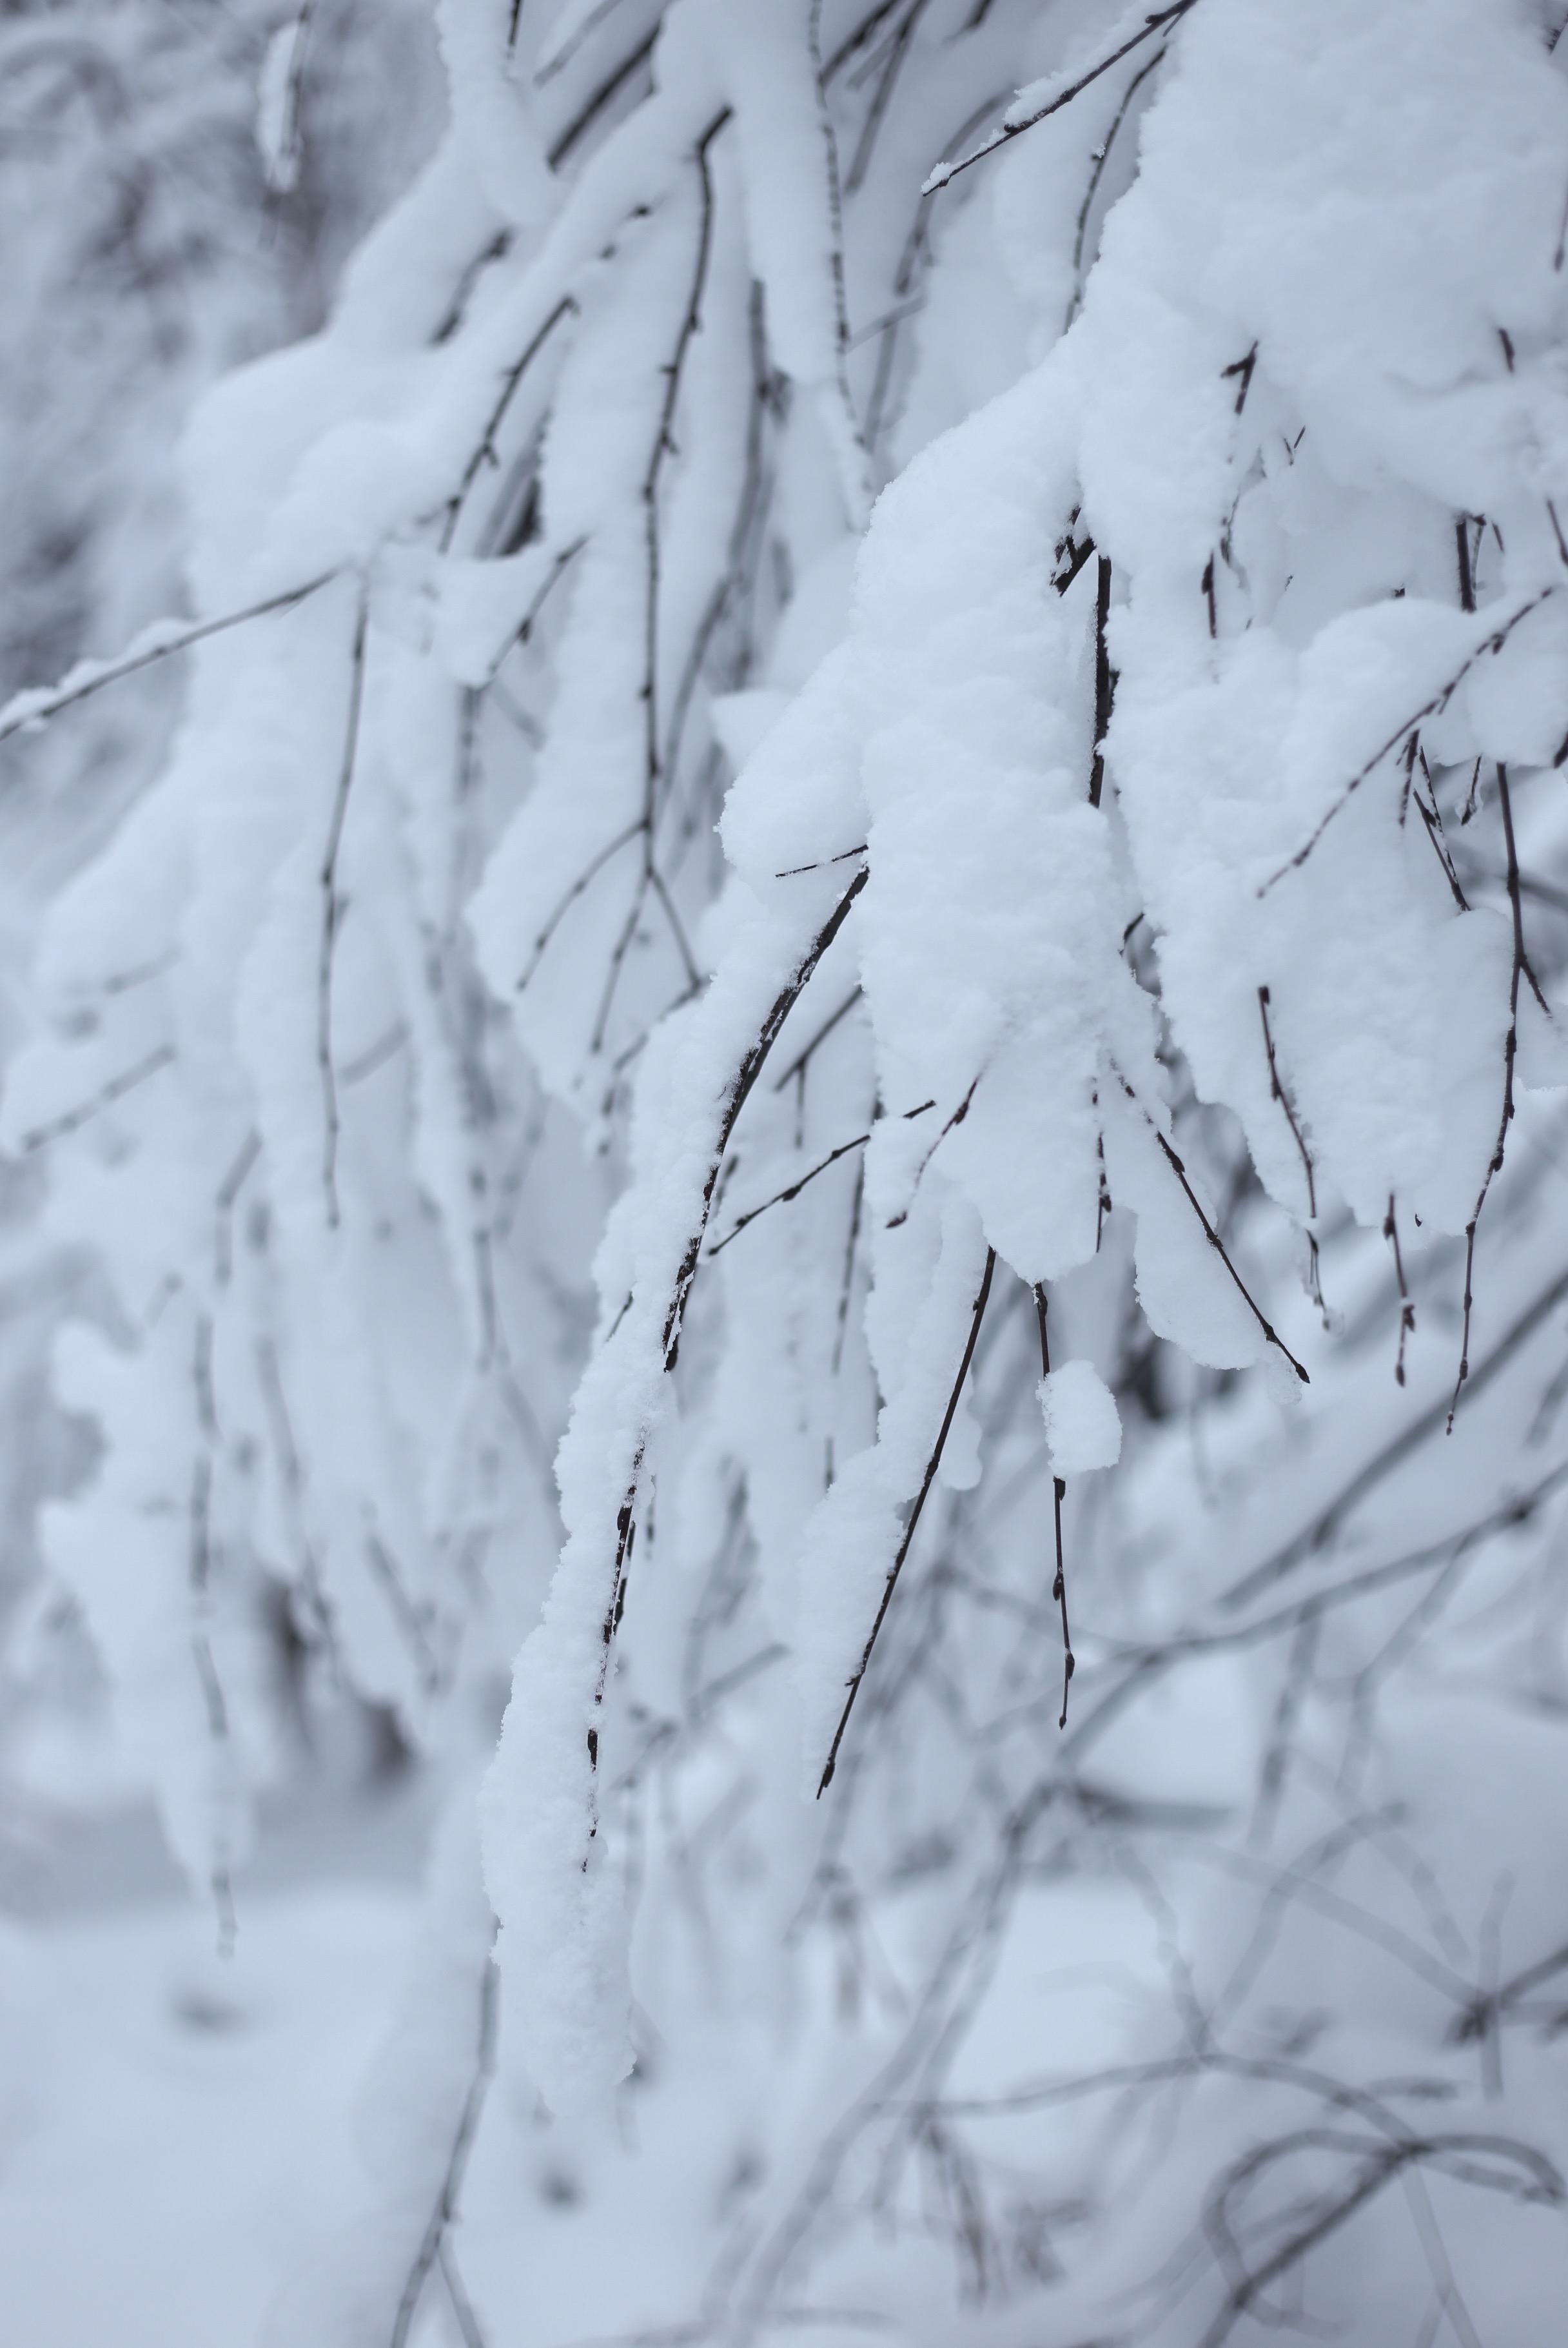 snow piled on trees